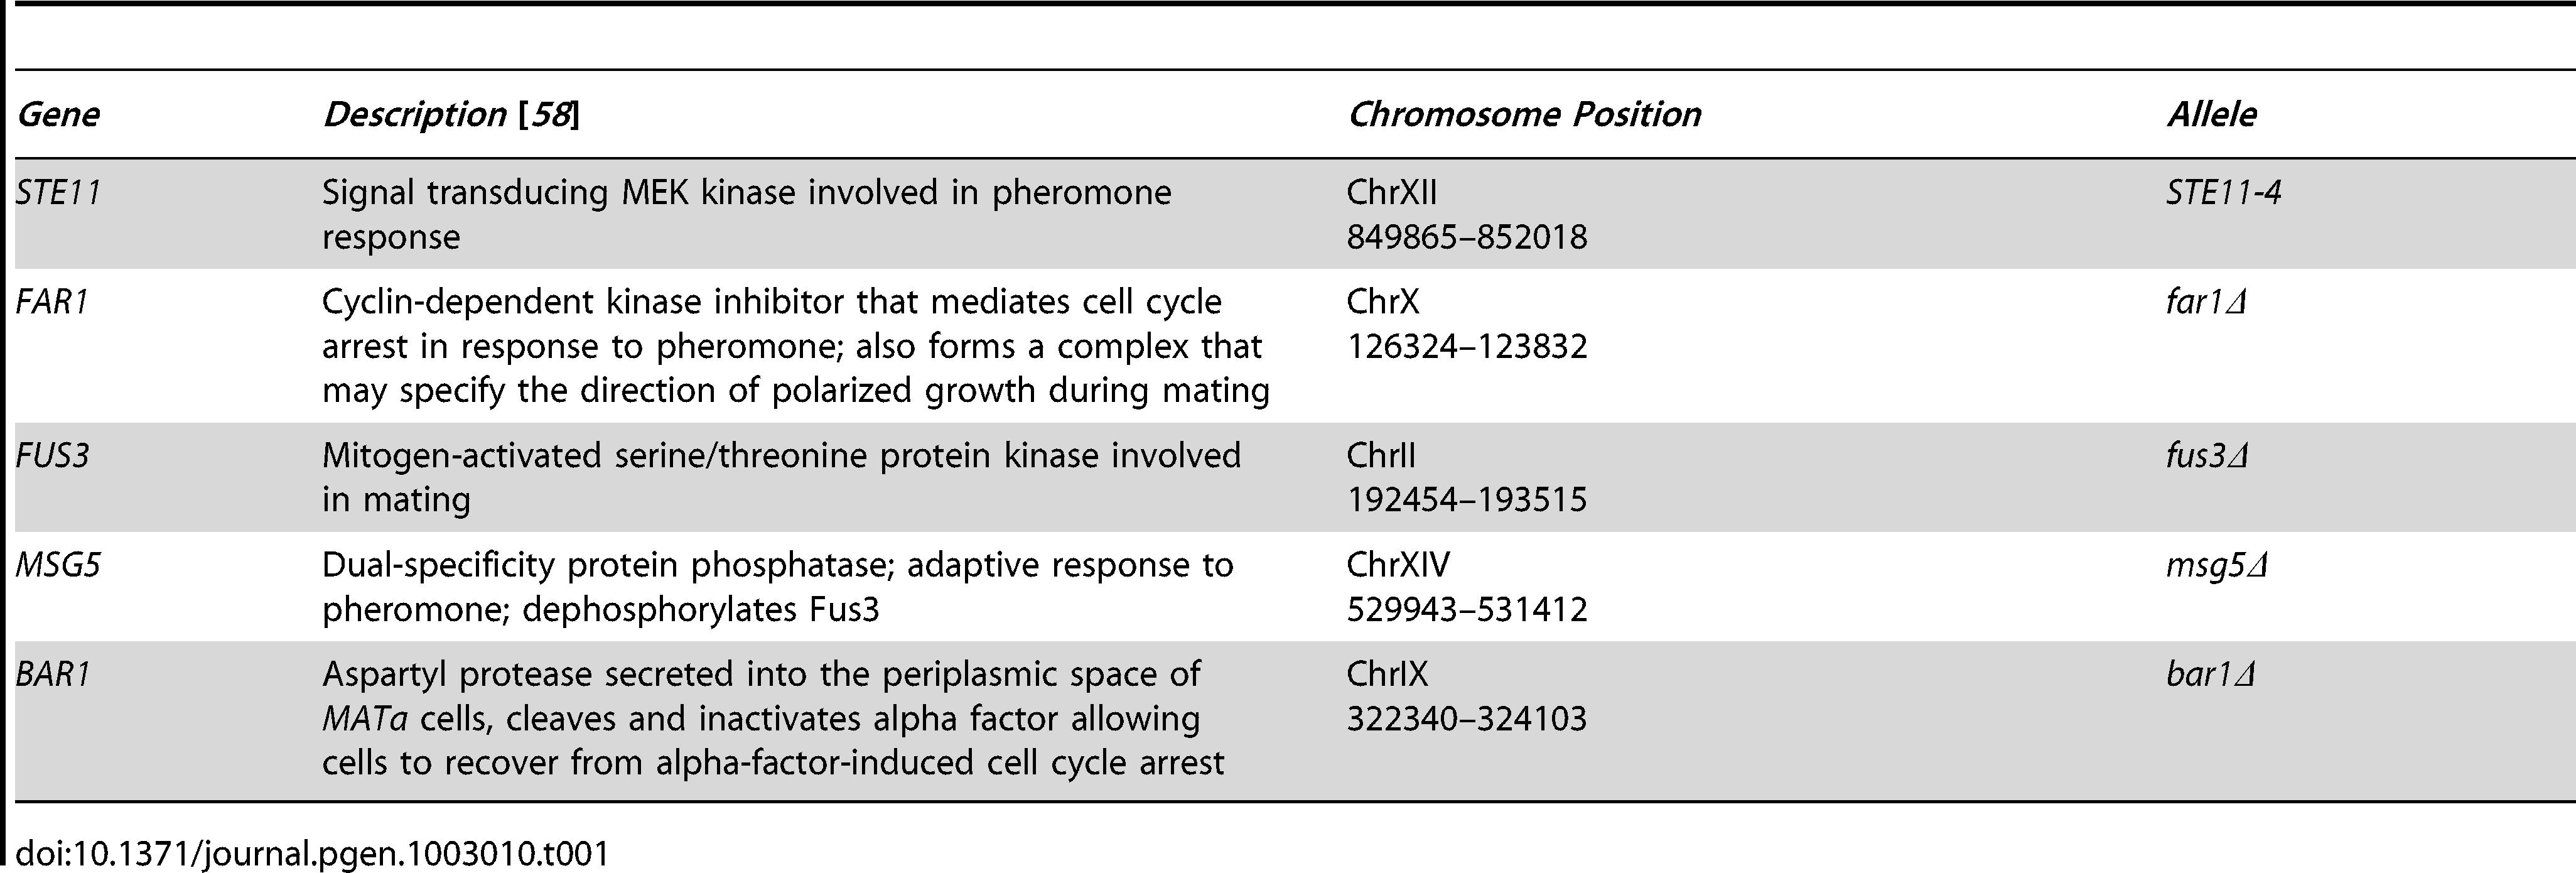 Genetic perturbations in this study.